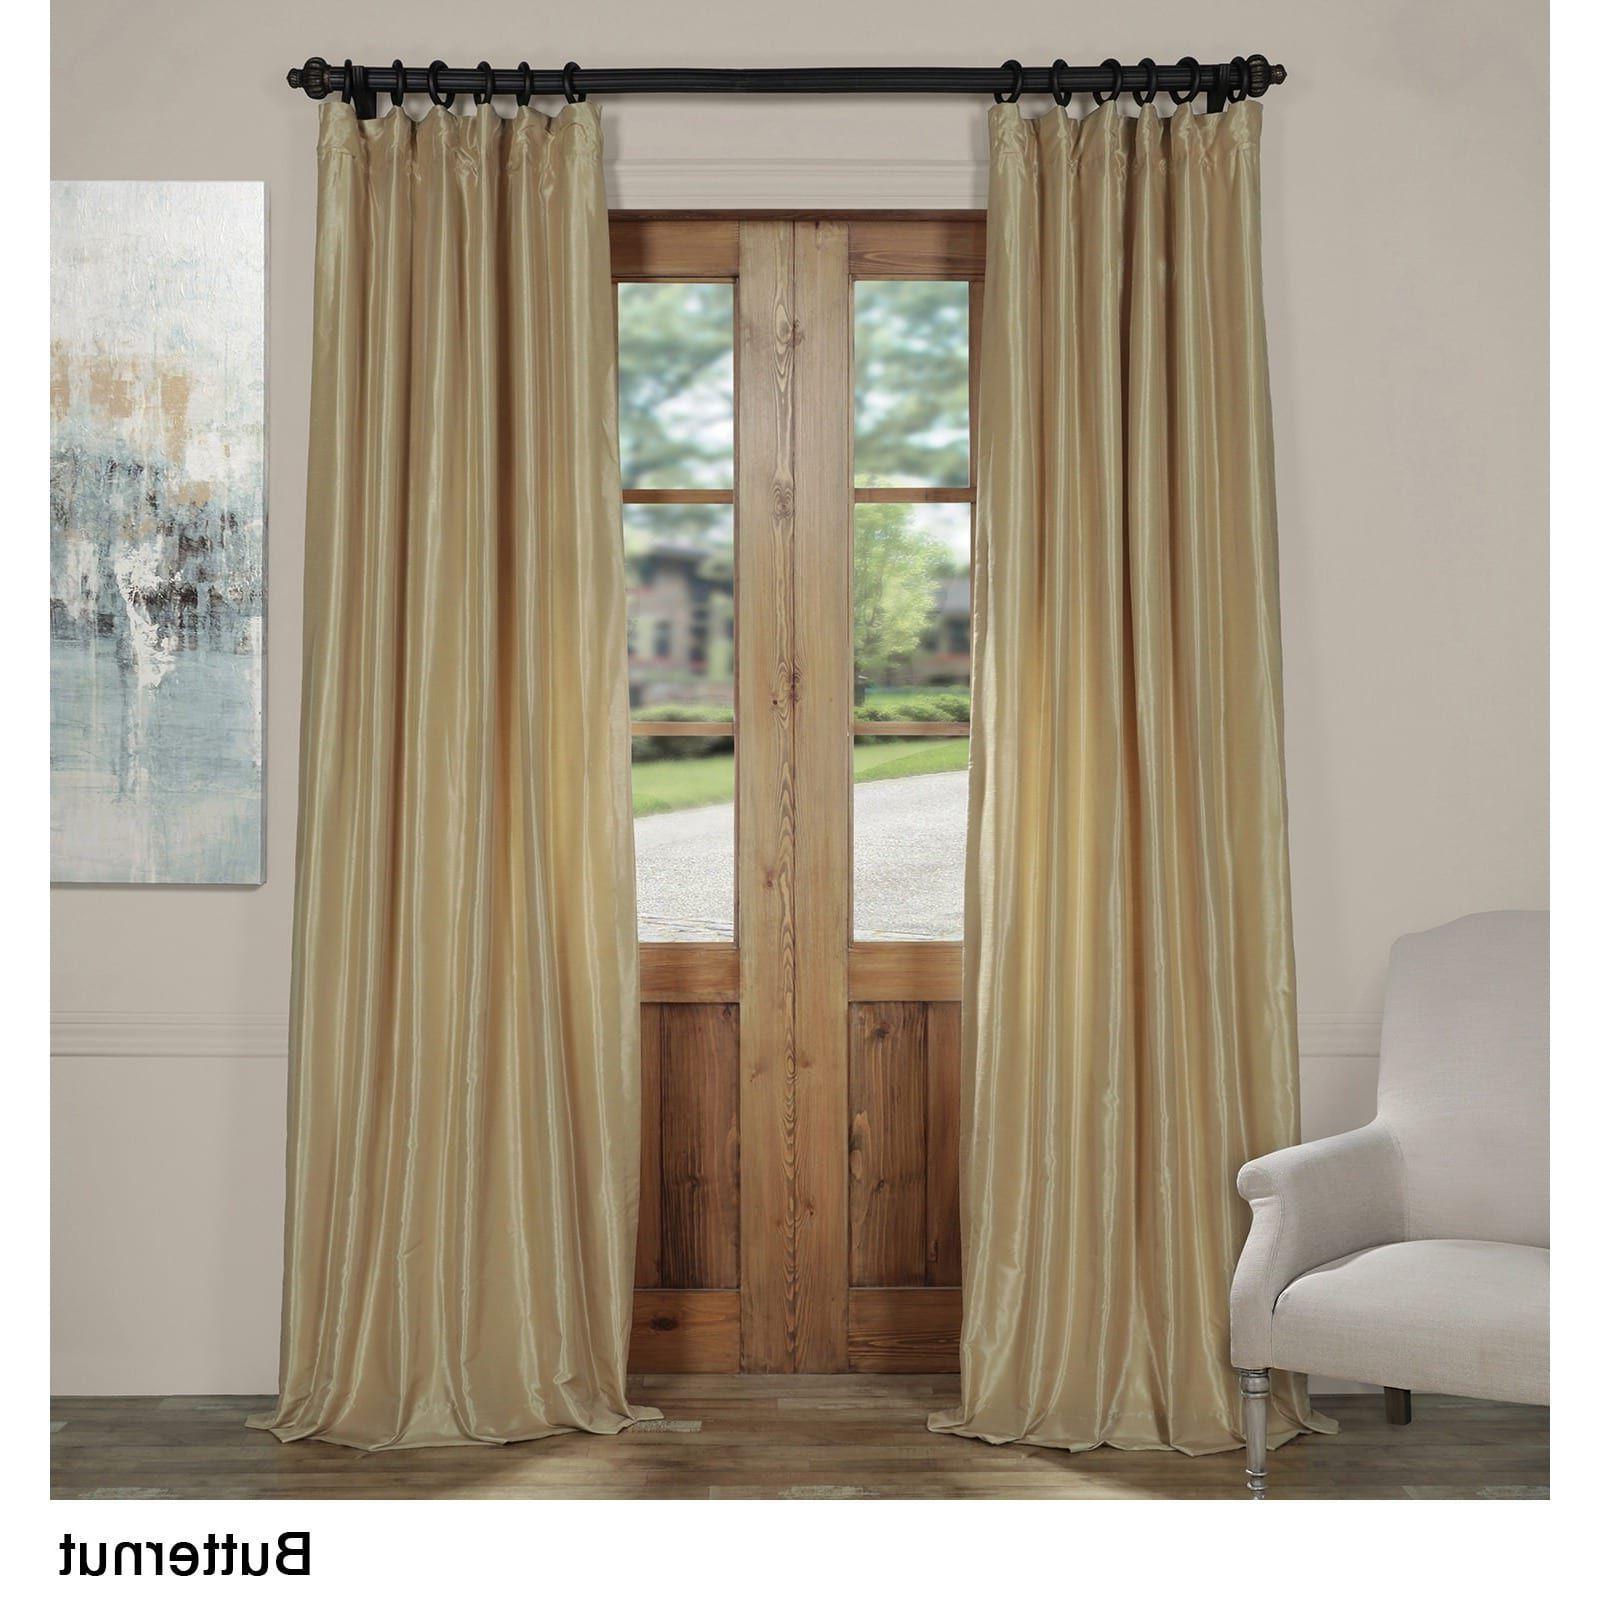 2020 Exclusive Fabrics Vintage Textured Faux Dupioni Silk Curtain With True Blackout Vintage Textured Faux Silk Curtain Panels (View 2 of 20)